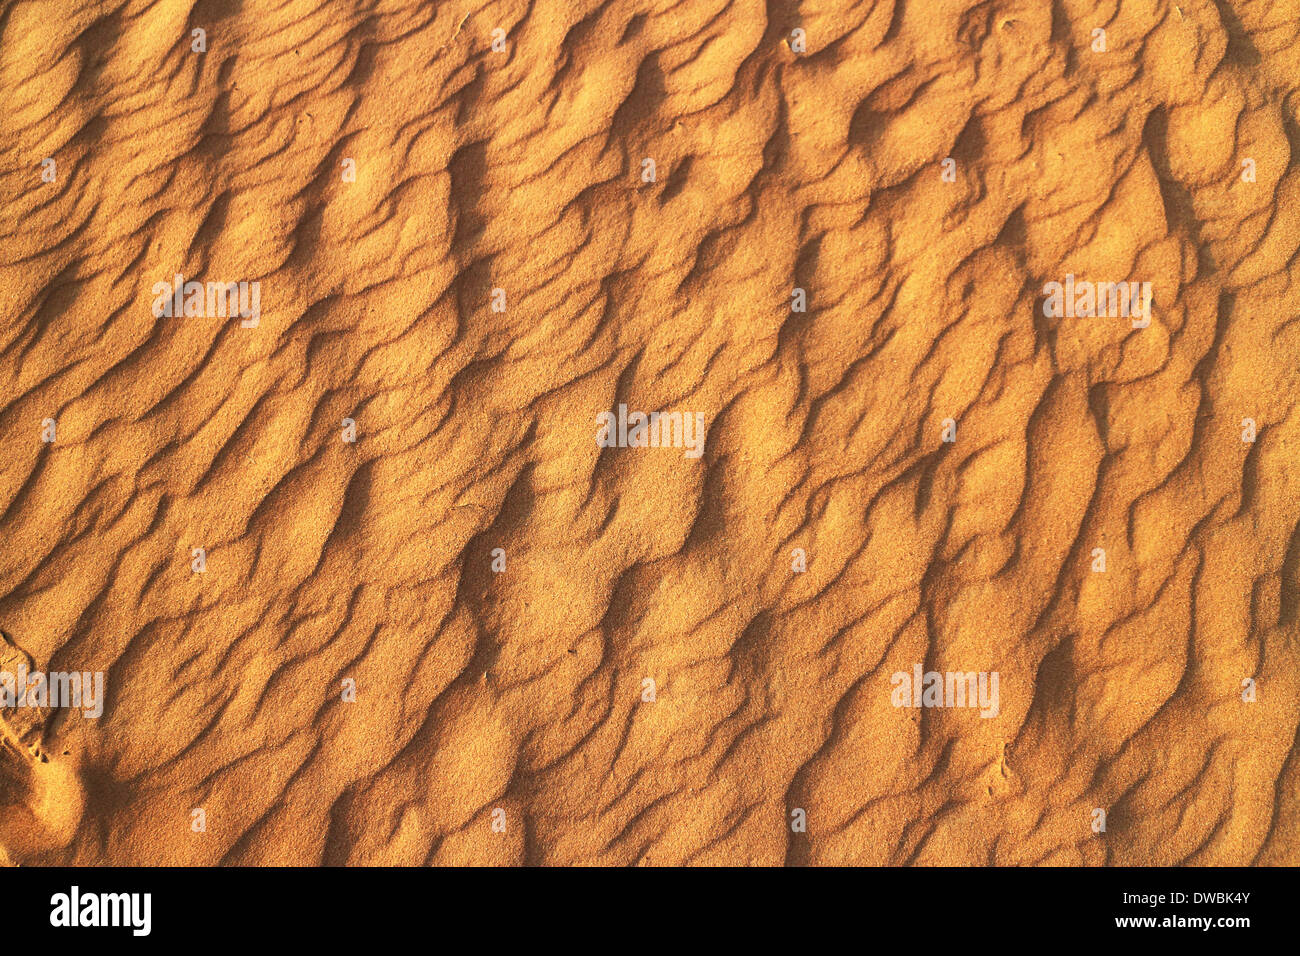 Wüste Rub al Khali - Ras al Khaima - Stock Image